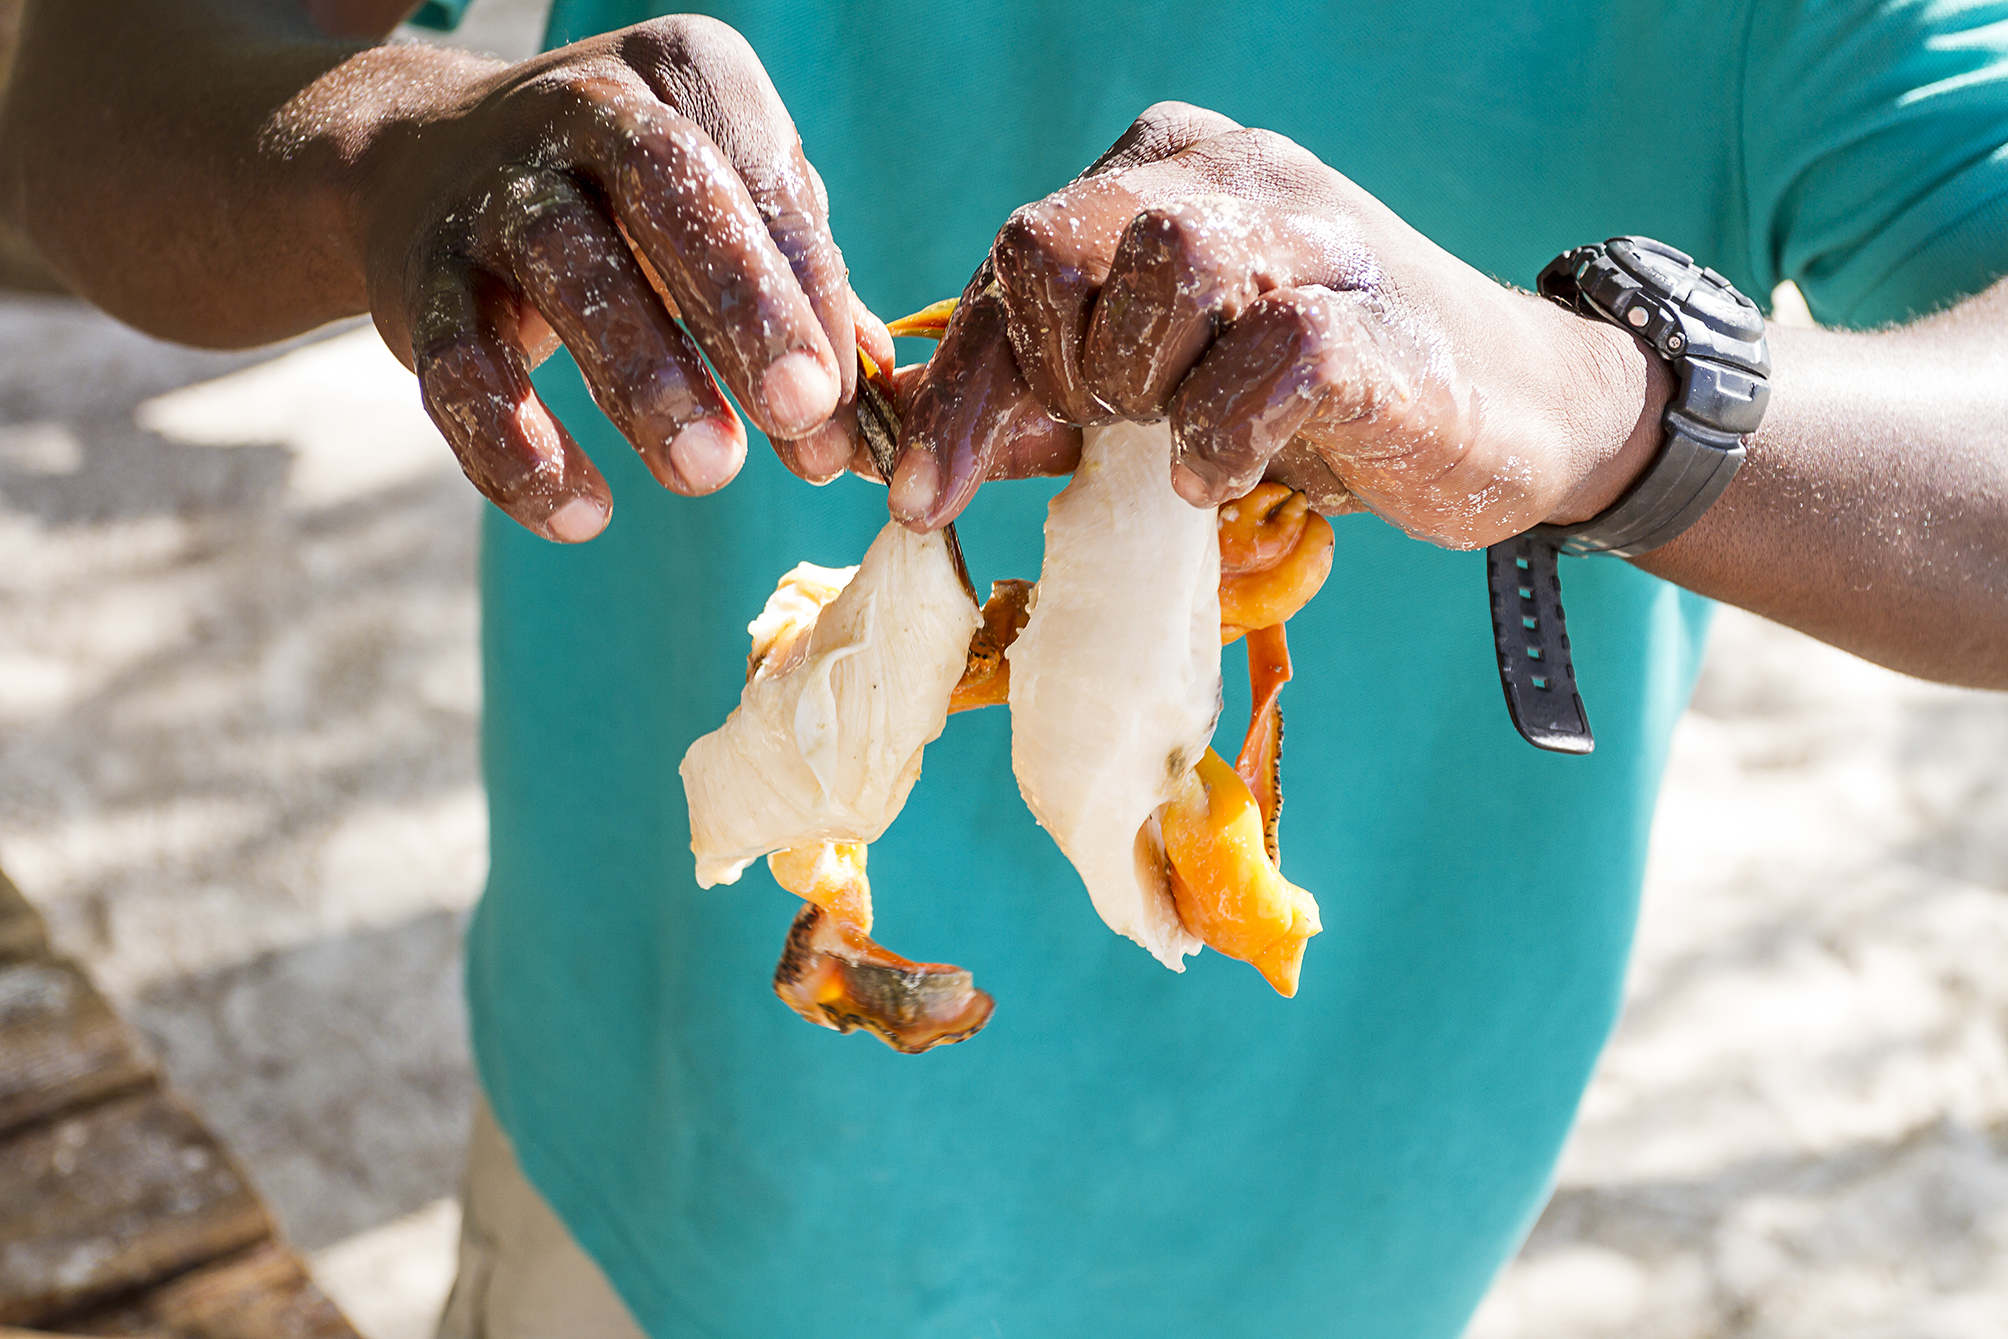 Preping conch